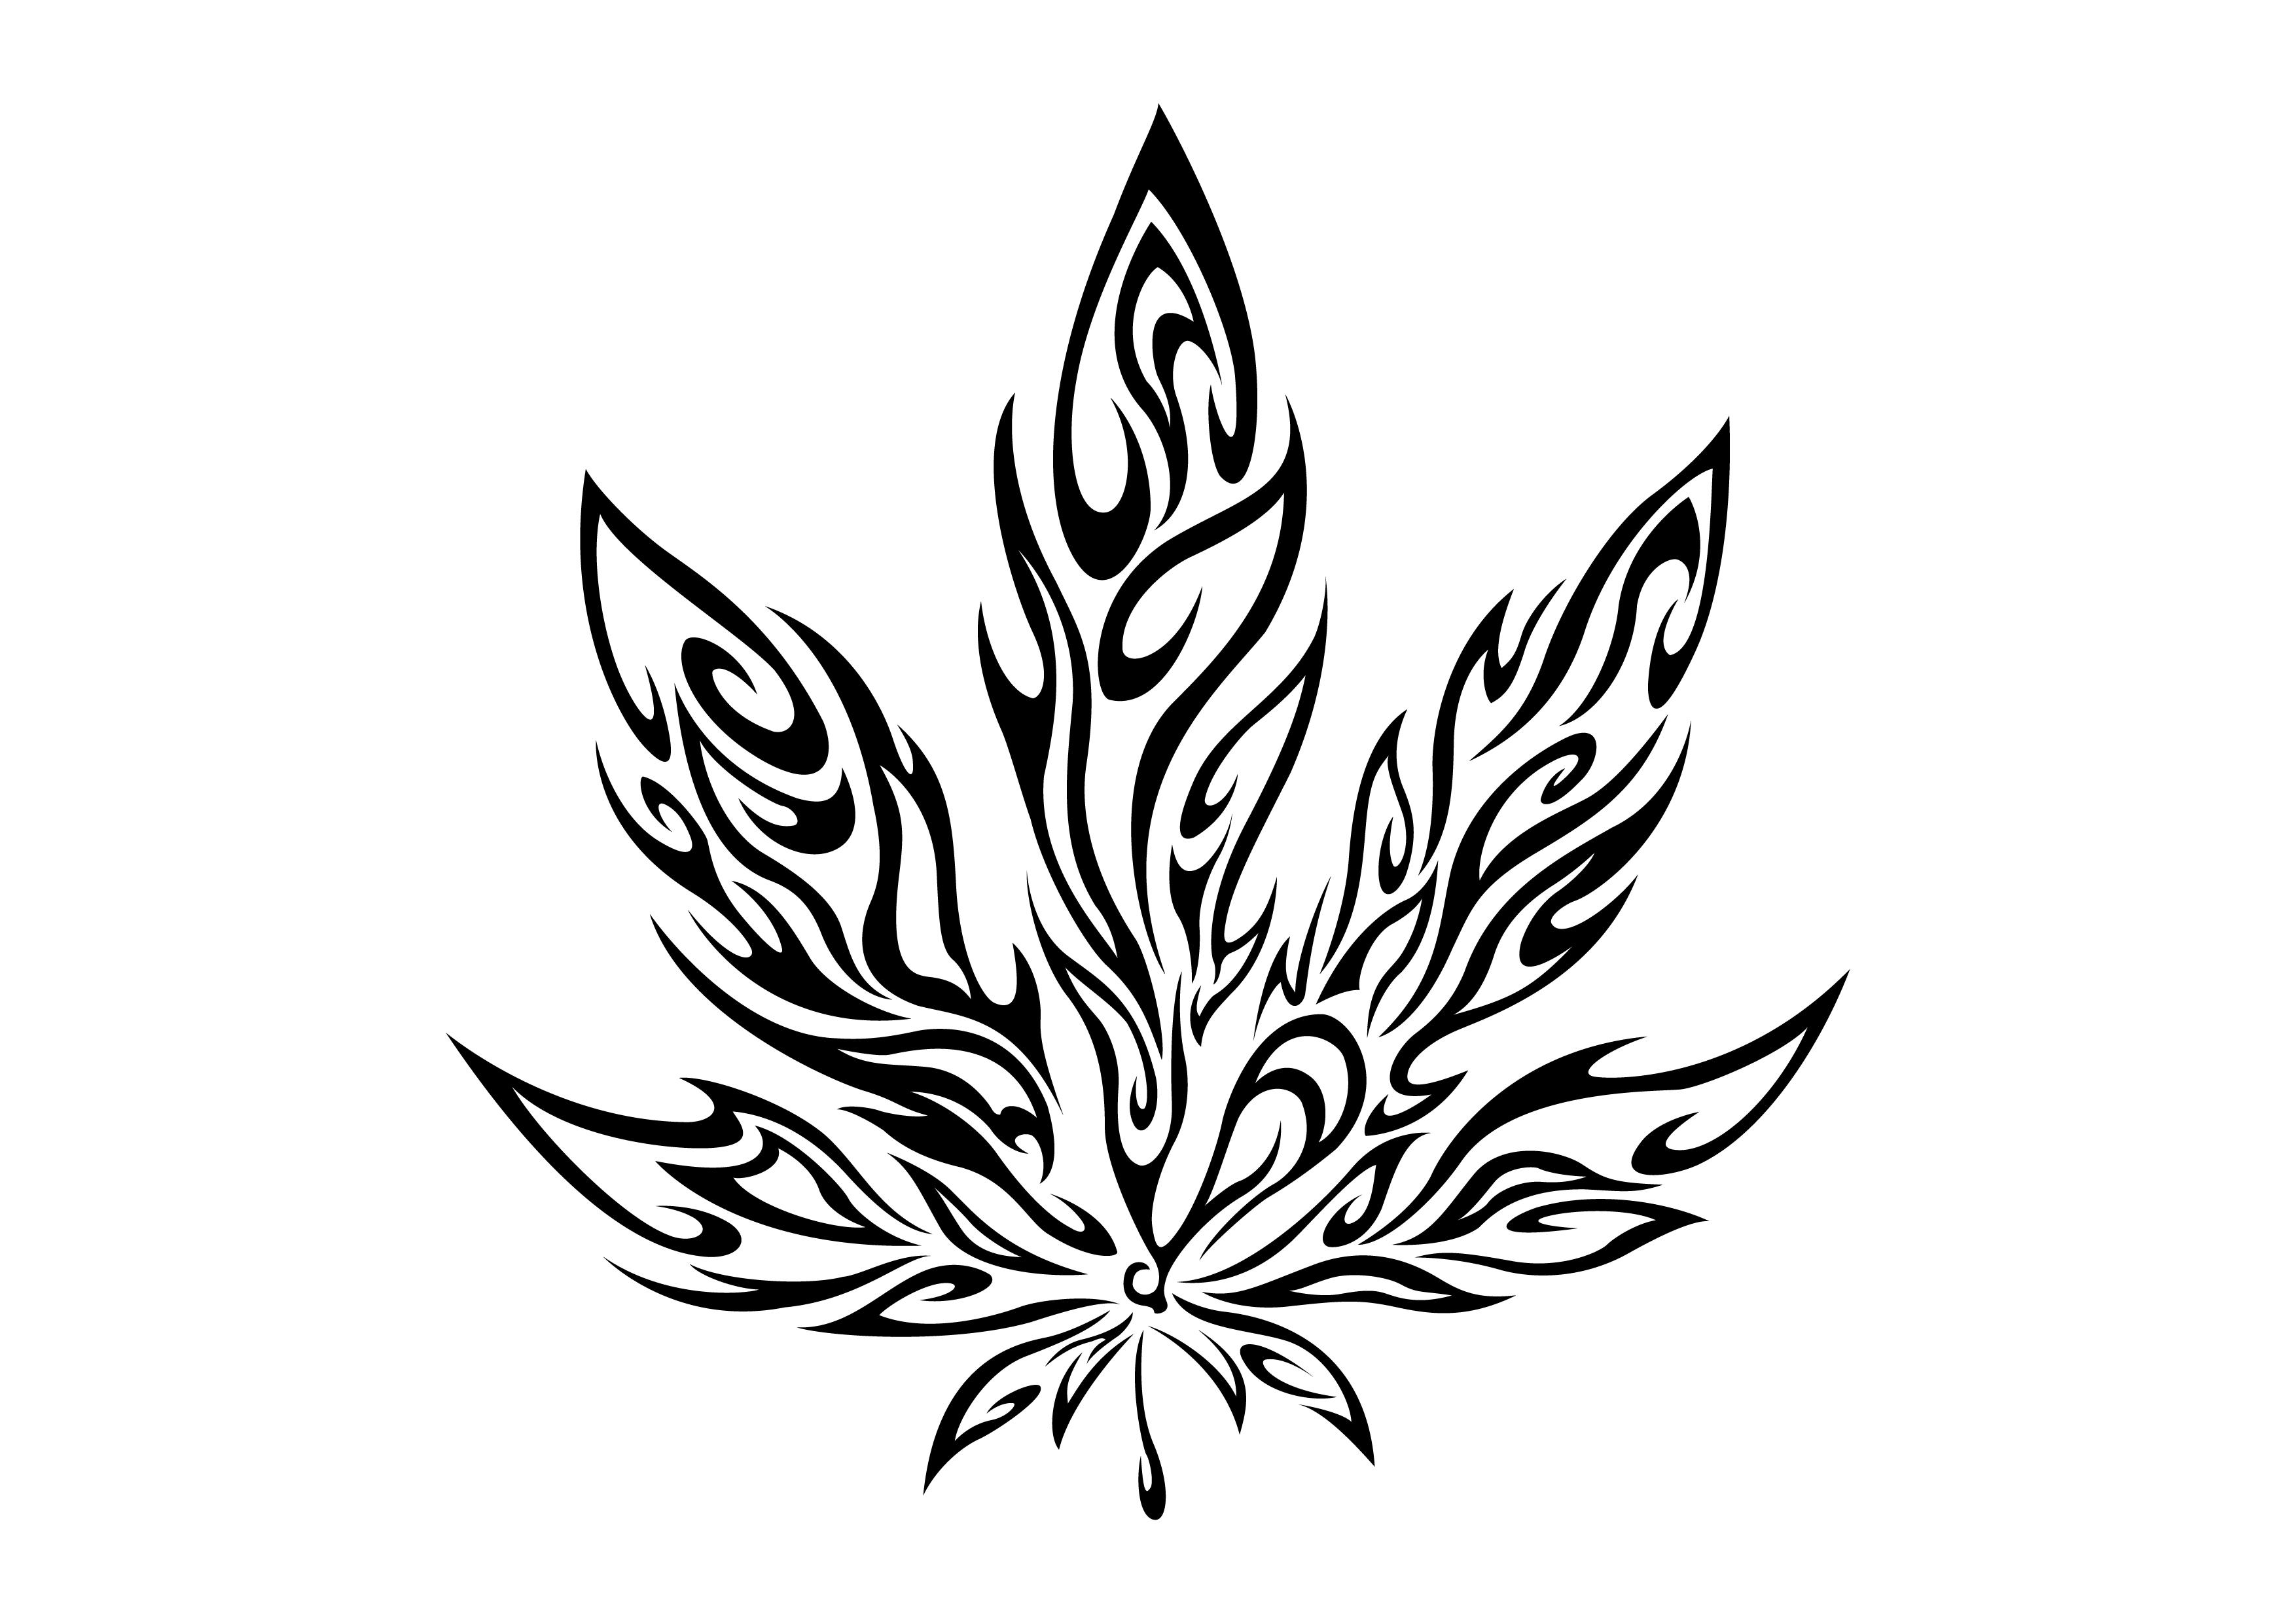 3508x2480 Drawing Of Pot Leaf Cartoon Weed Plant